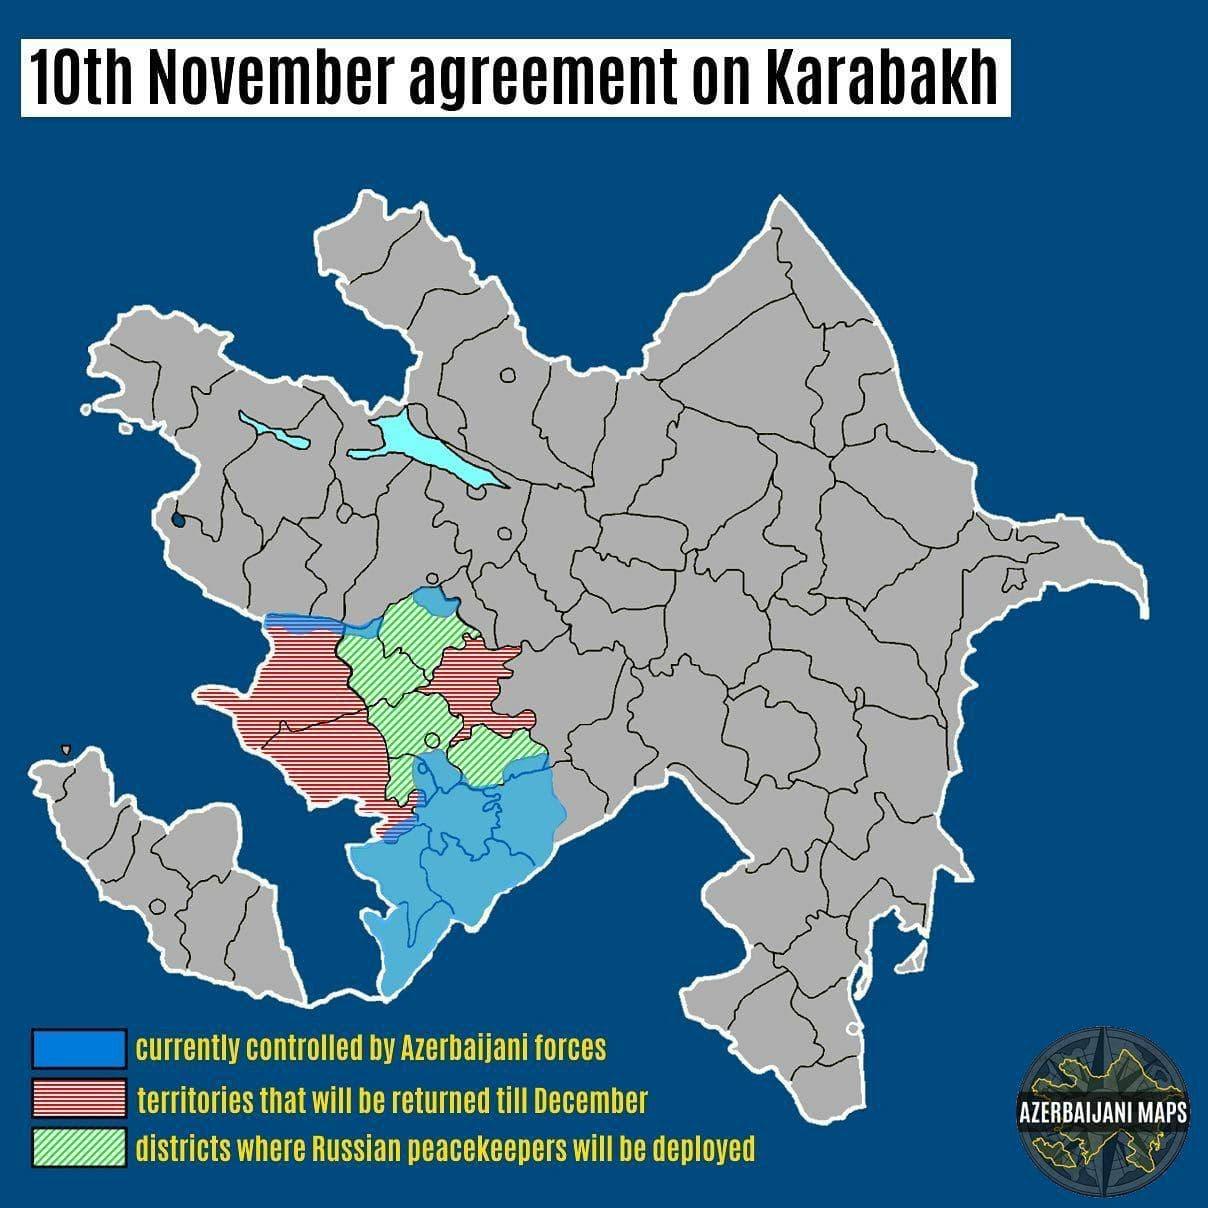 Вчерашние договоренности по Нагорному Карабаху наглядно на карте